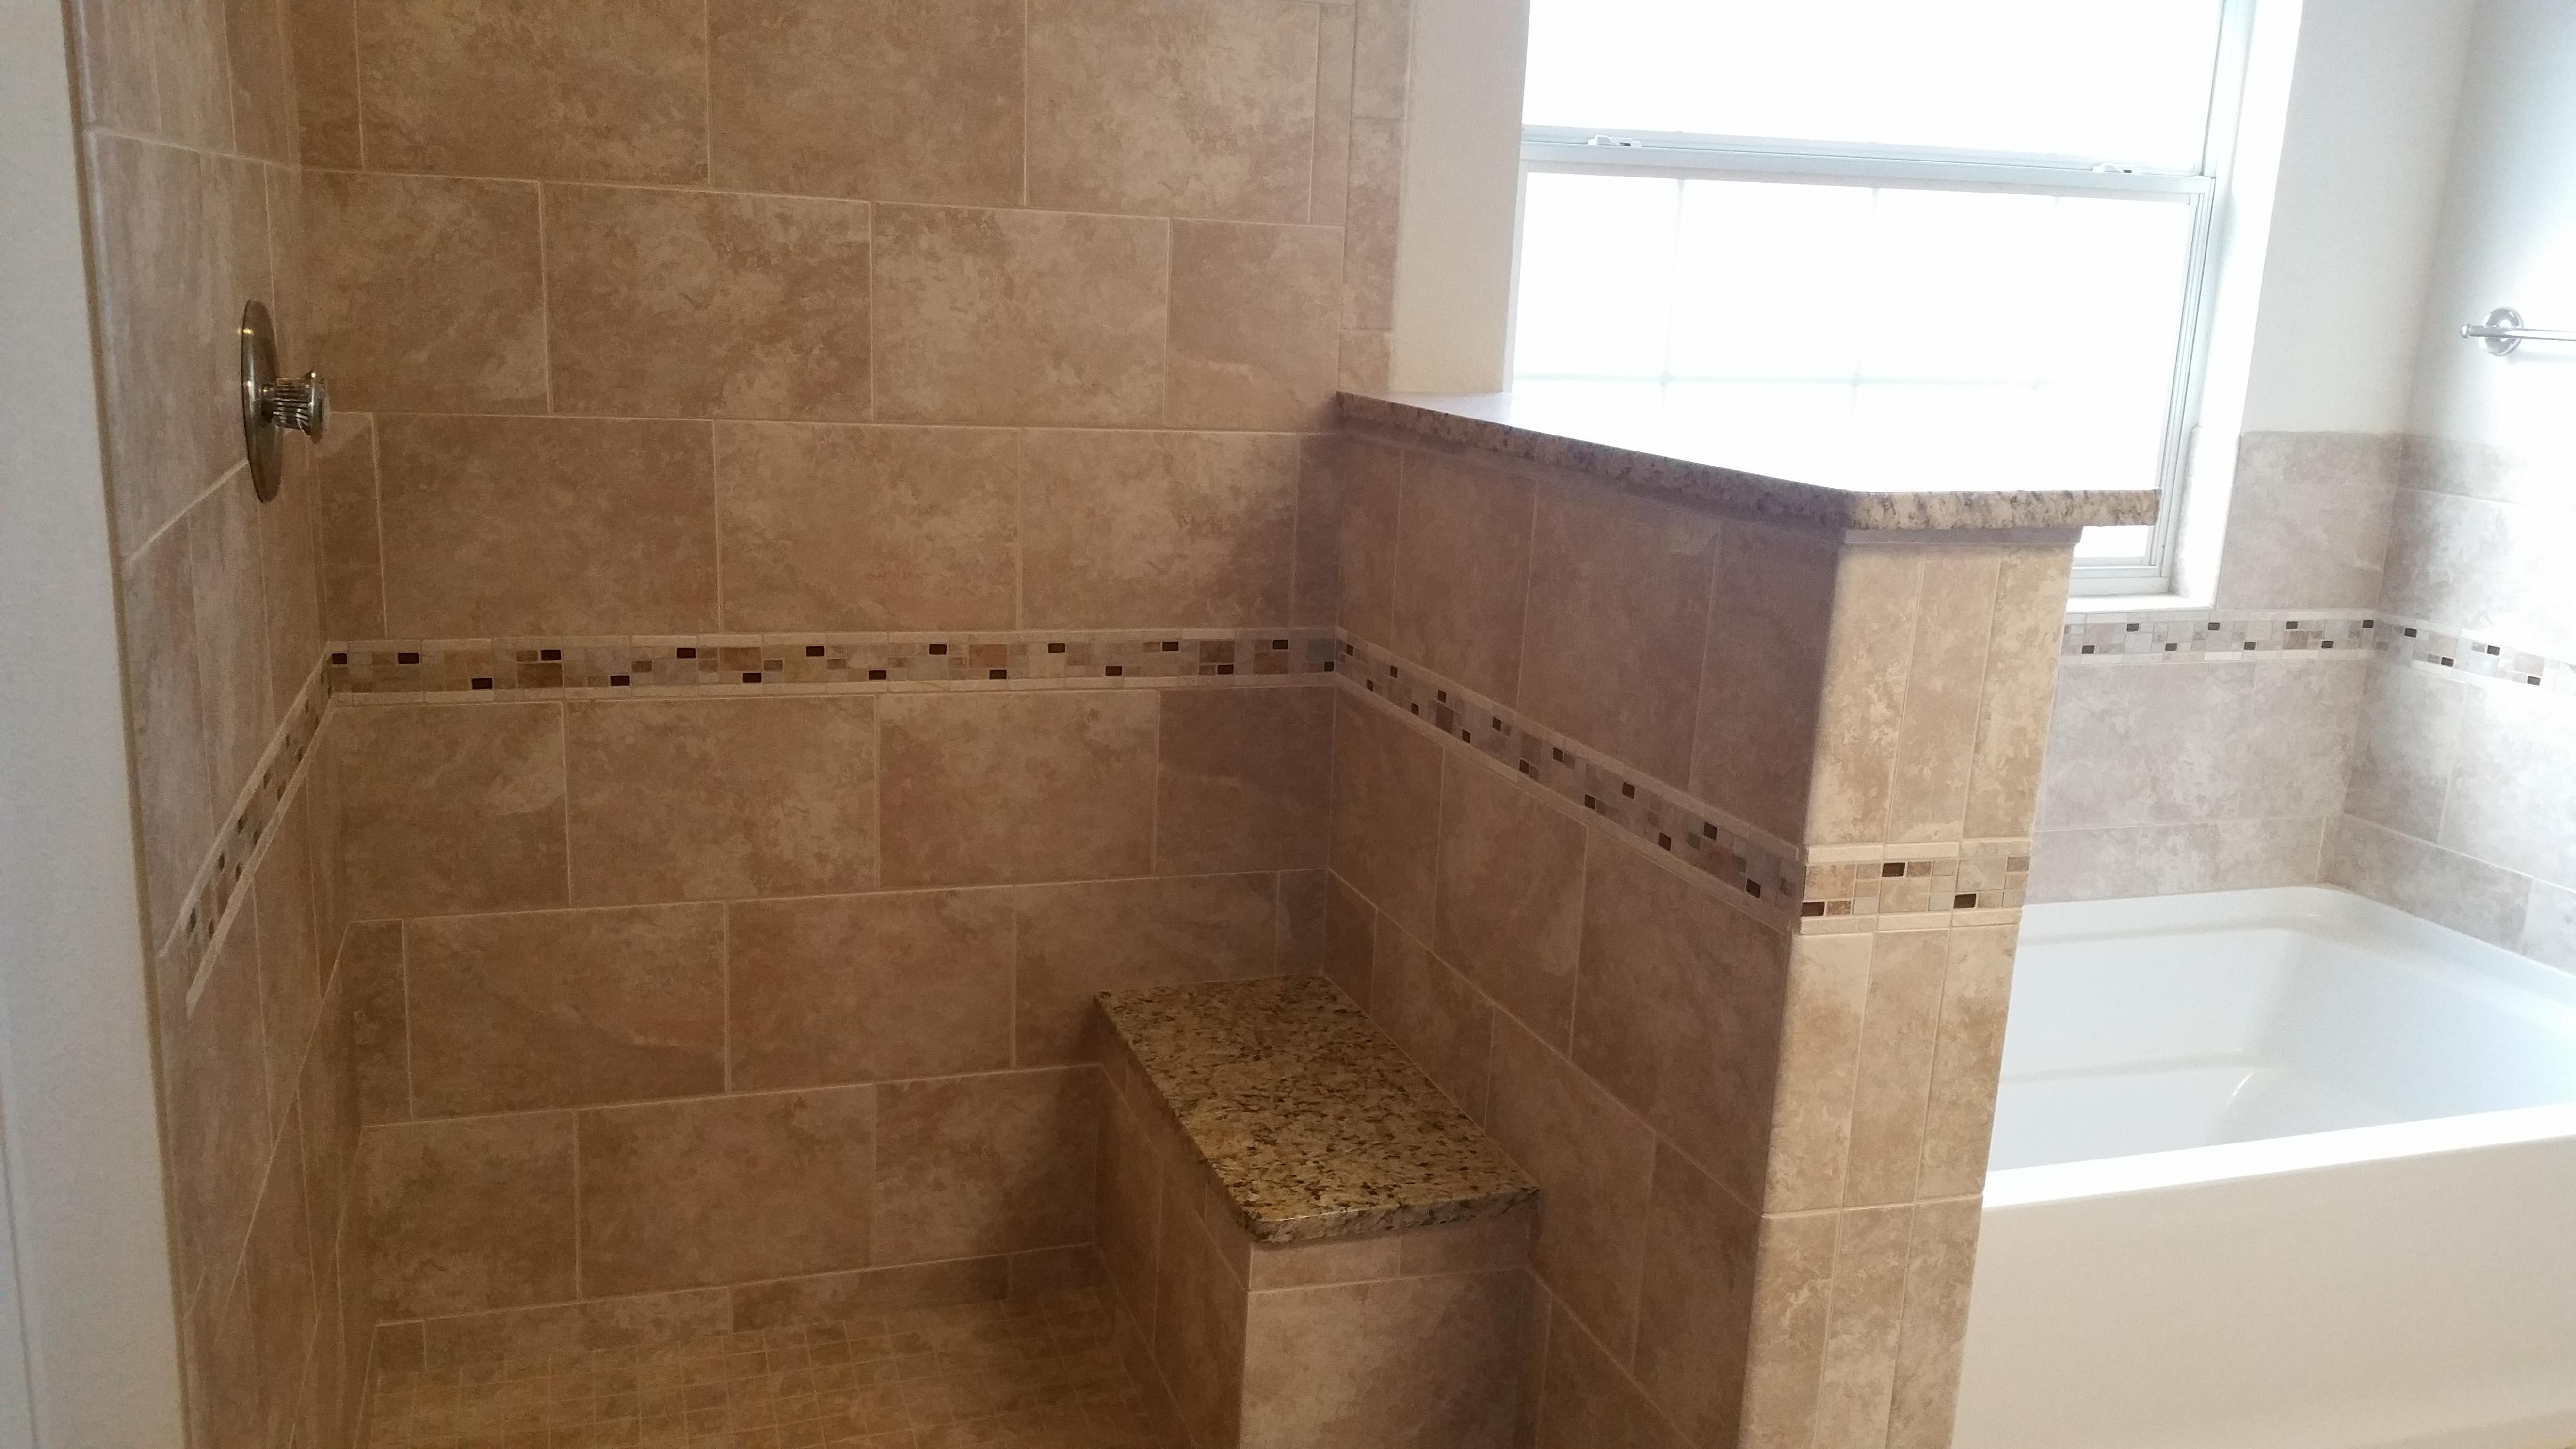 omg kitchen & bath remodeling - member - san antonio, tx 78217